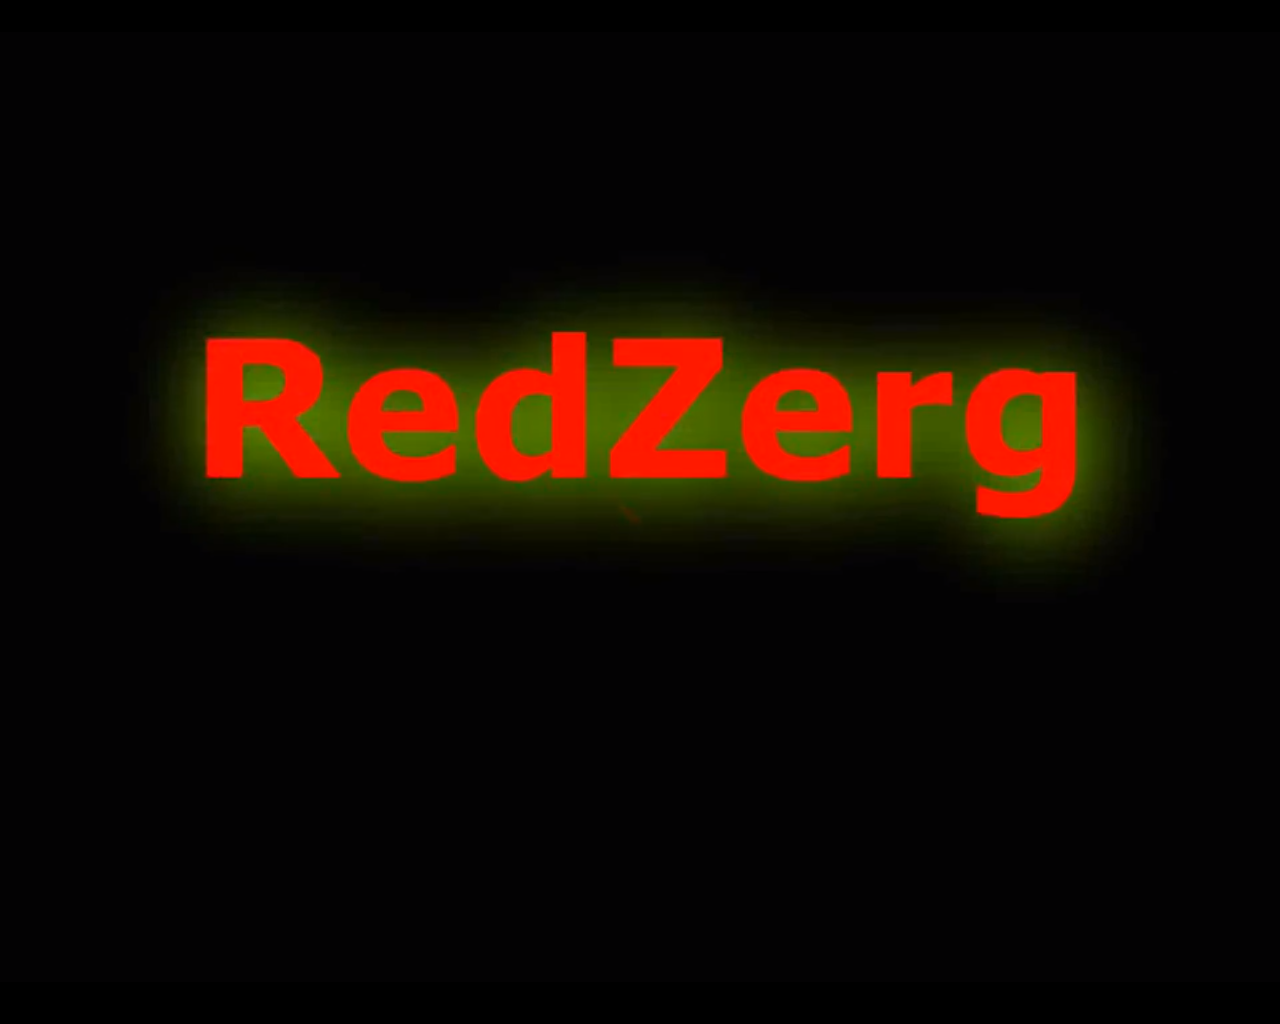 значки ,скачать бесплатно - клан и али ...: soft4game.ucoz.ru/load/kartinki/klan_i_ali_znachki/klan_znachki...